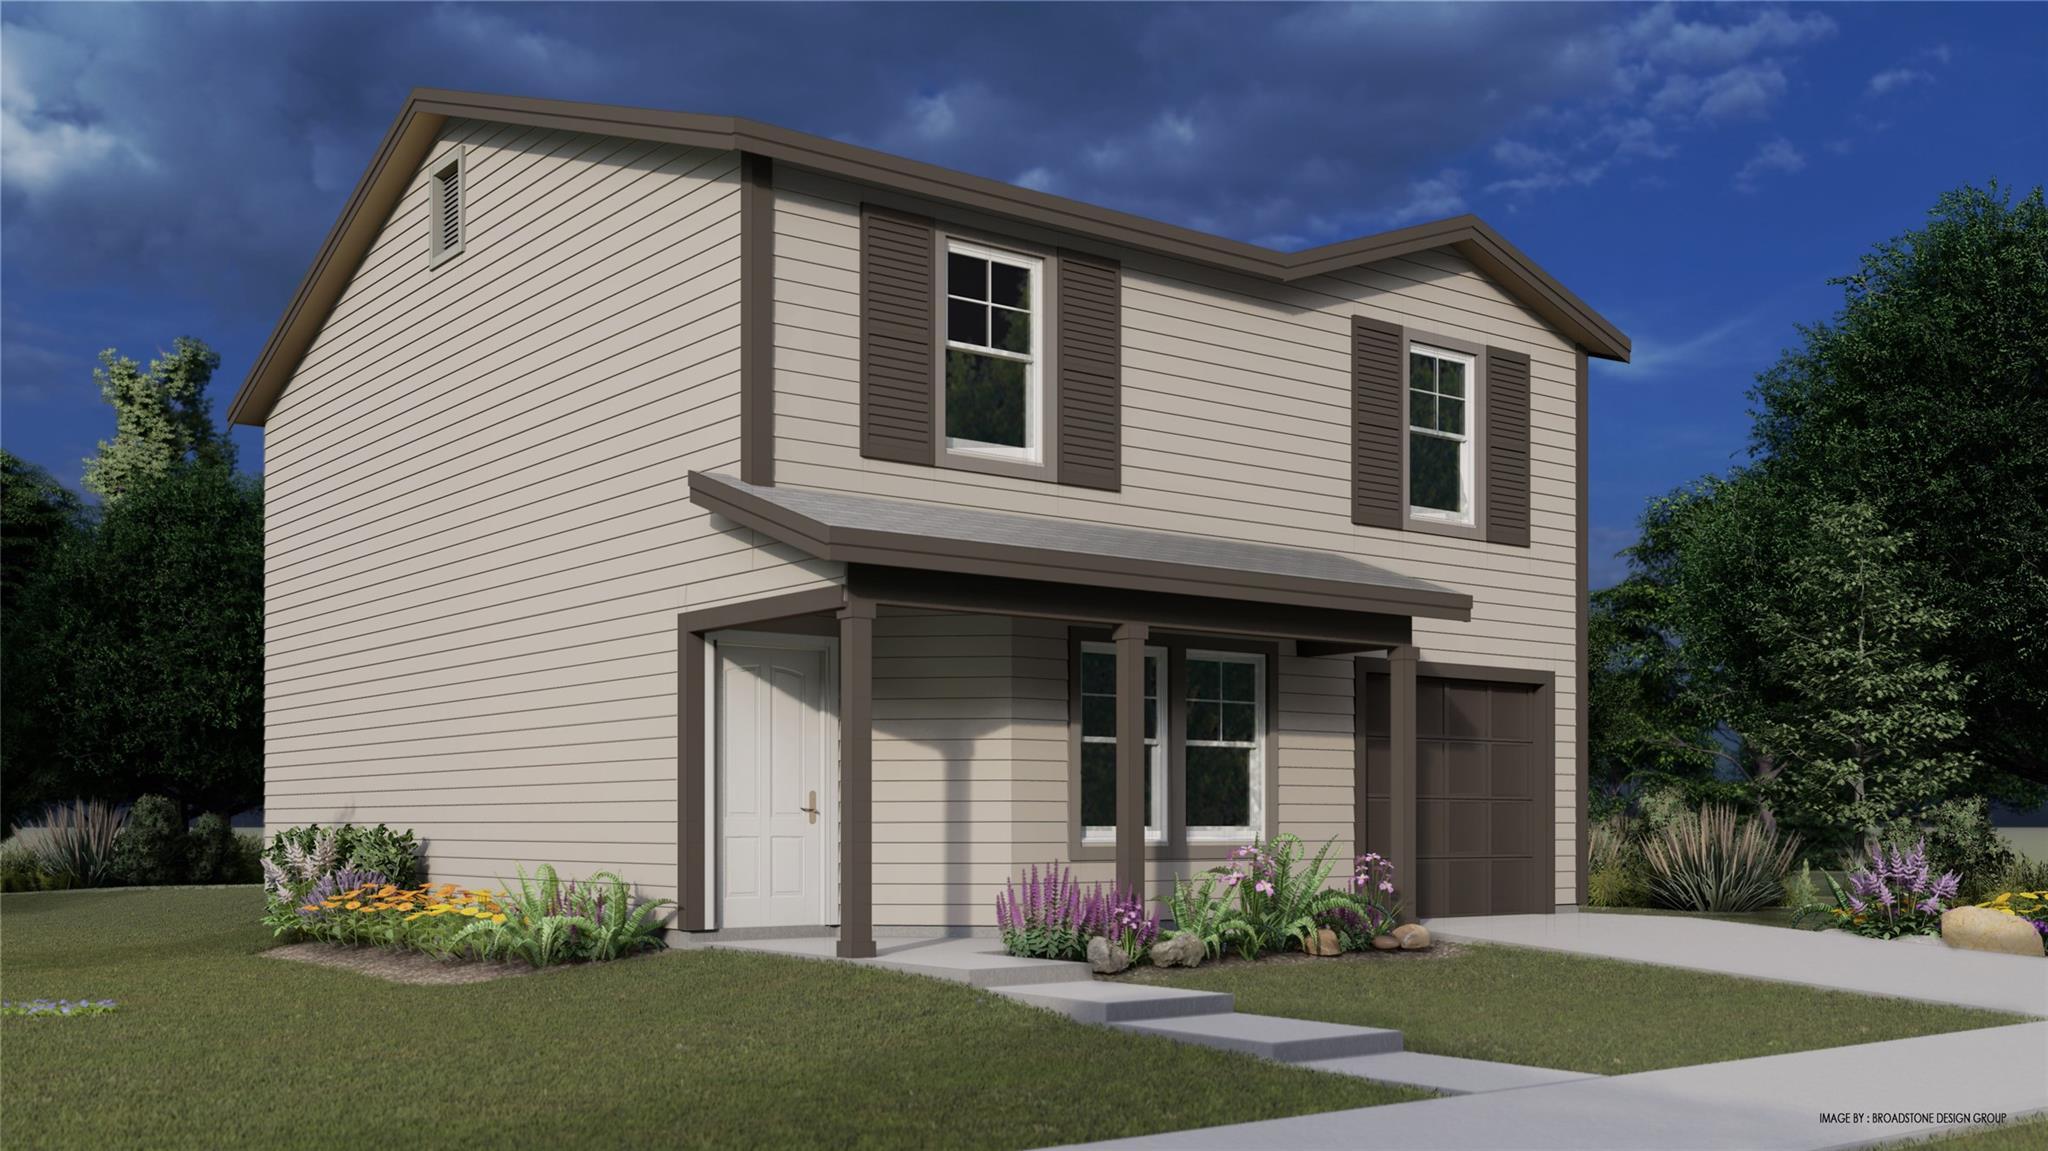 5202 fairchild st Property Photo - Houston, TX real estate listing